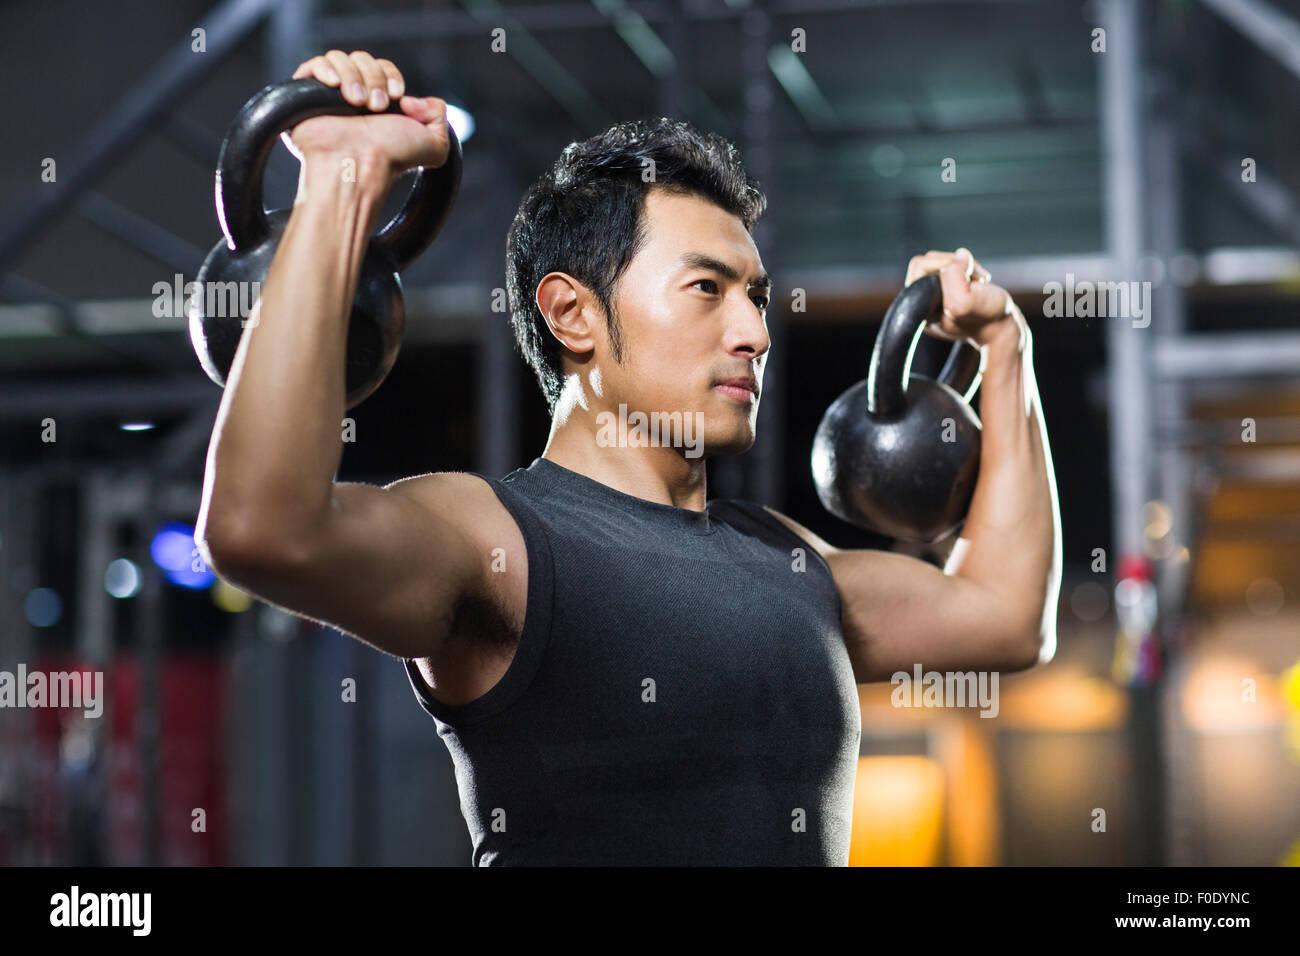 Jeune homme avec formation en sport crossfit kettlebells Photo Stock